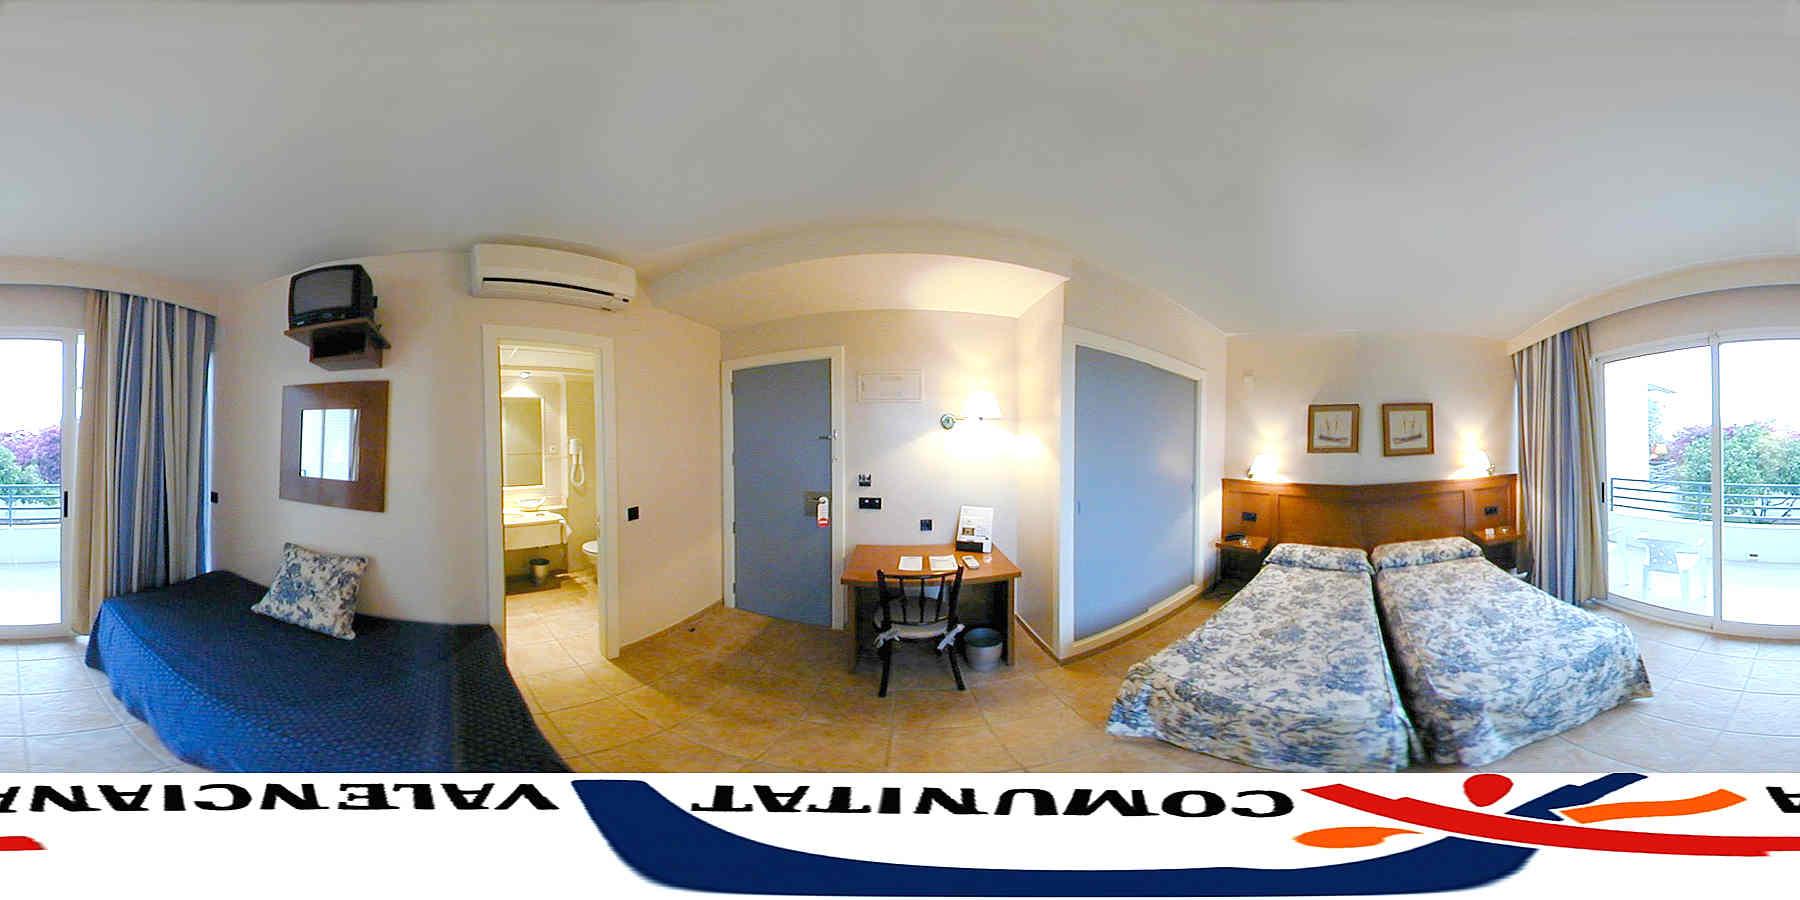 HOTEL-RESIDENCIA ABRIL